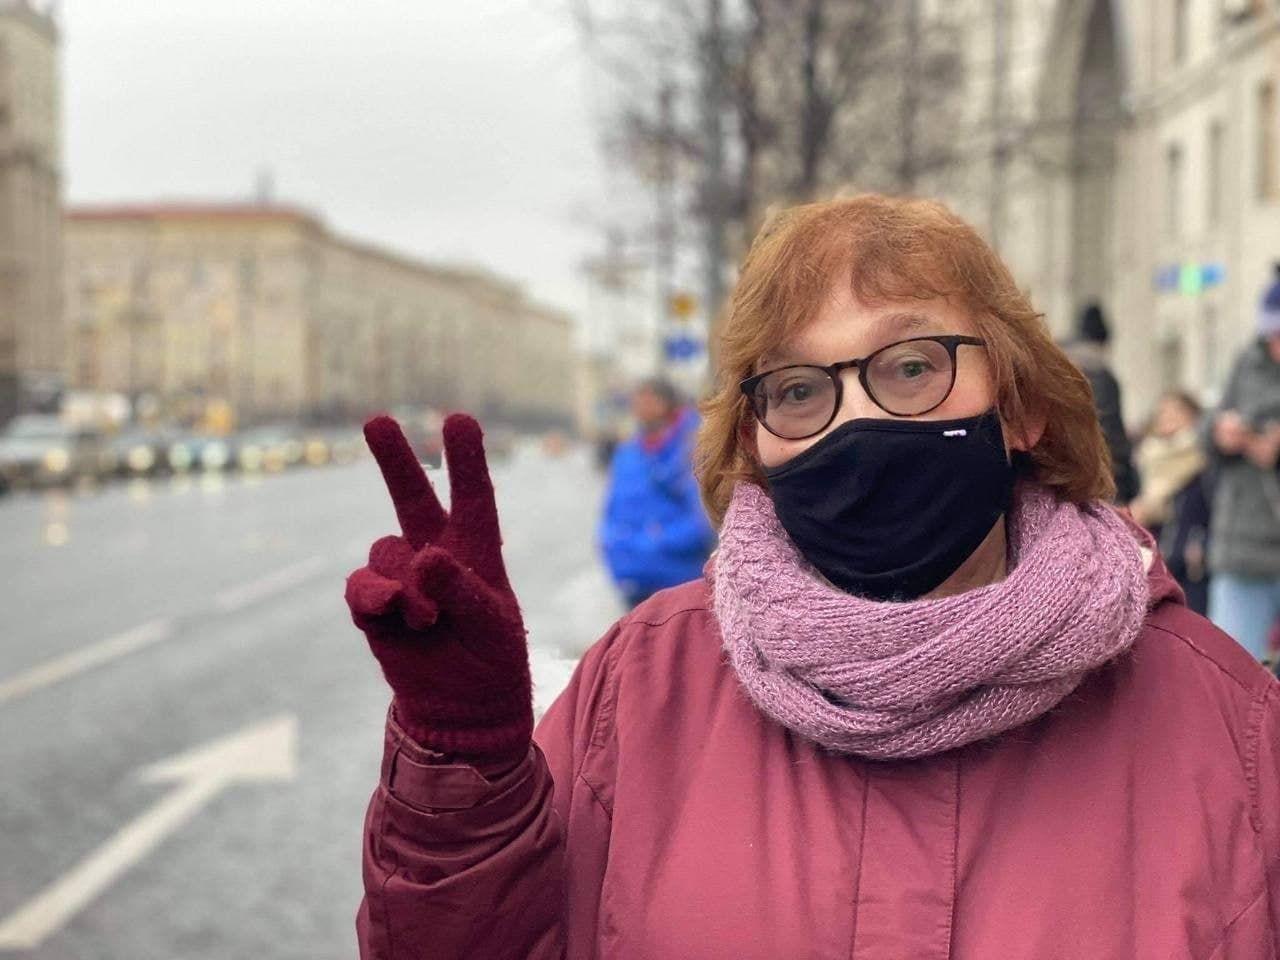 Мама Олексія Навального прийшла на протест